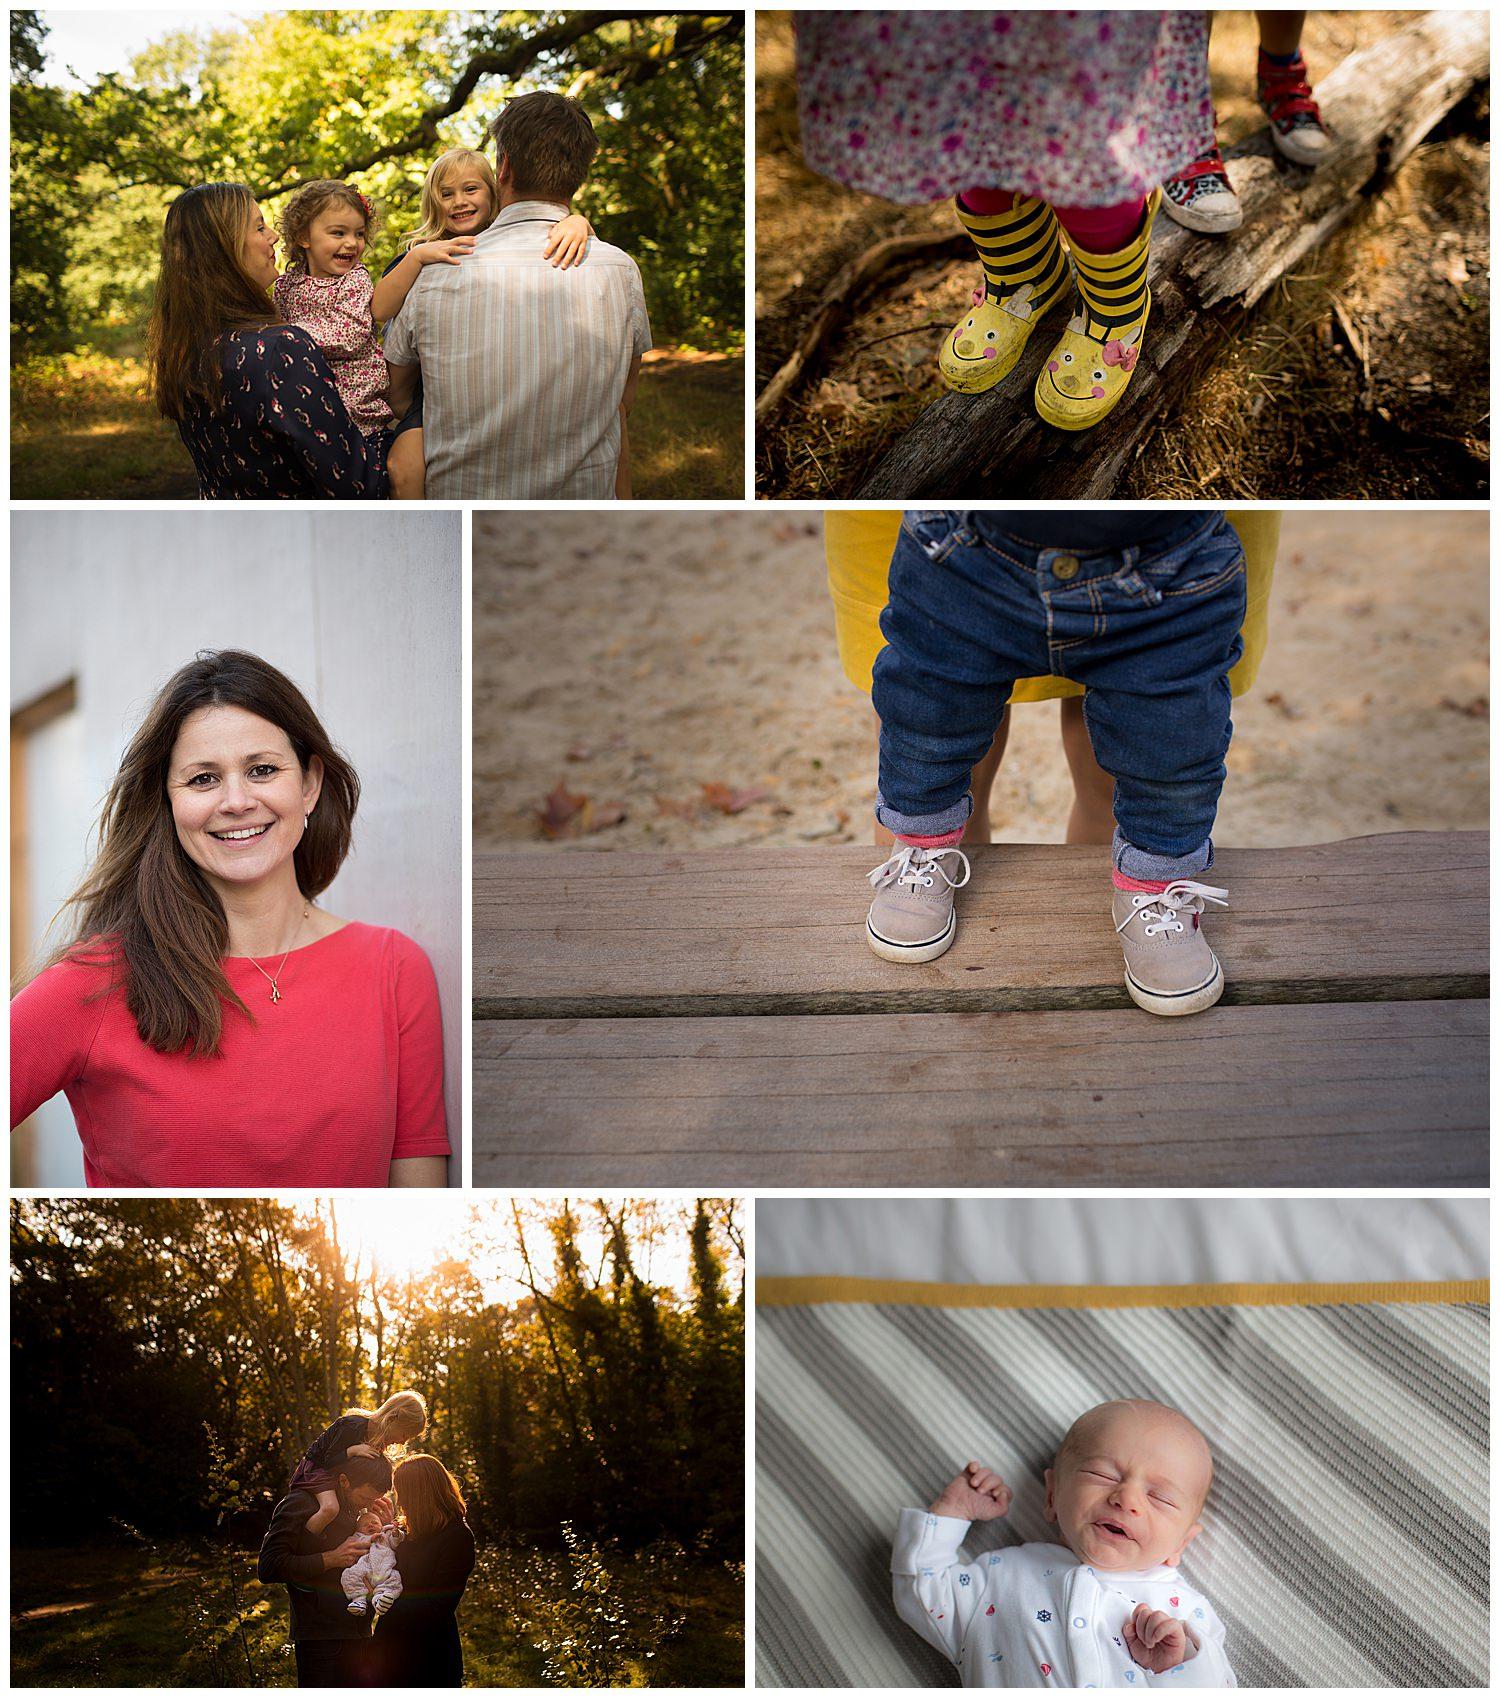 east-london-family-photographer-2018-roundup-3.jpg